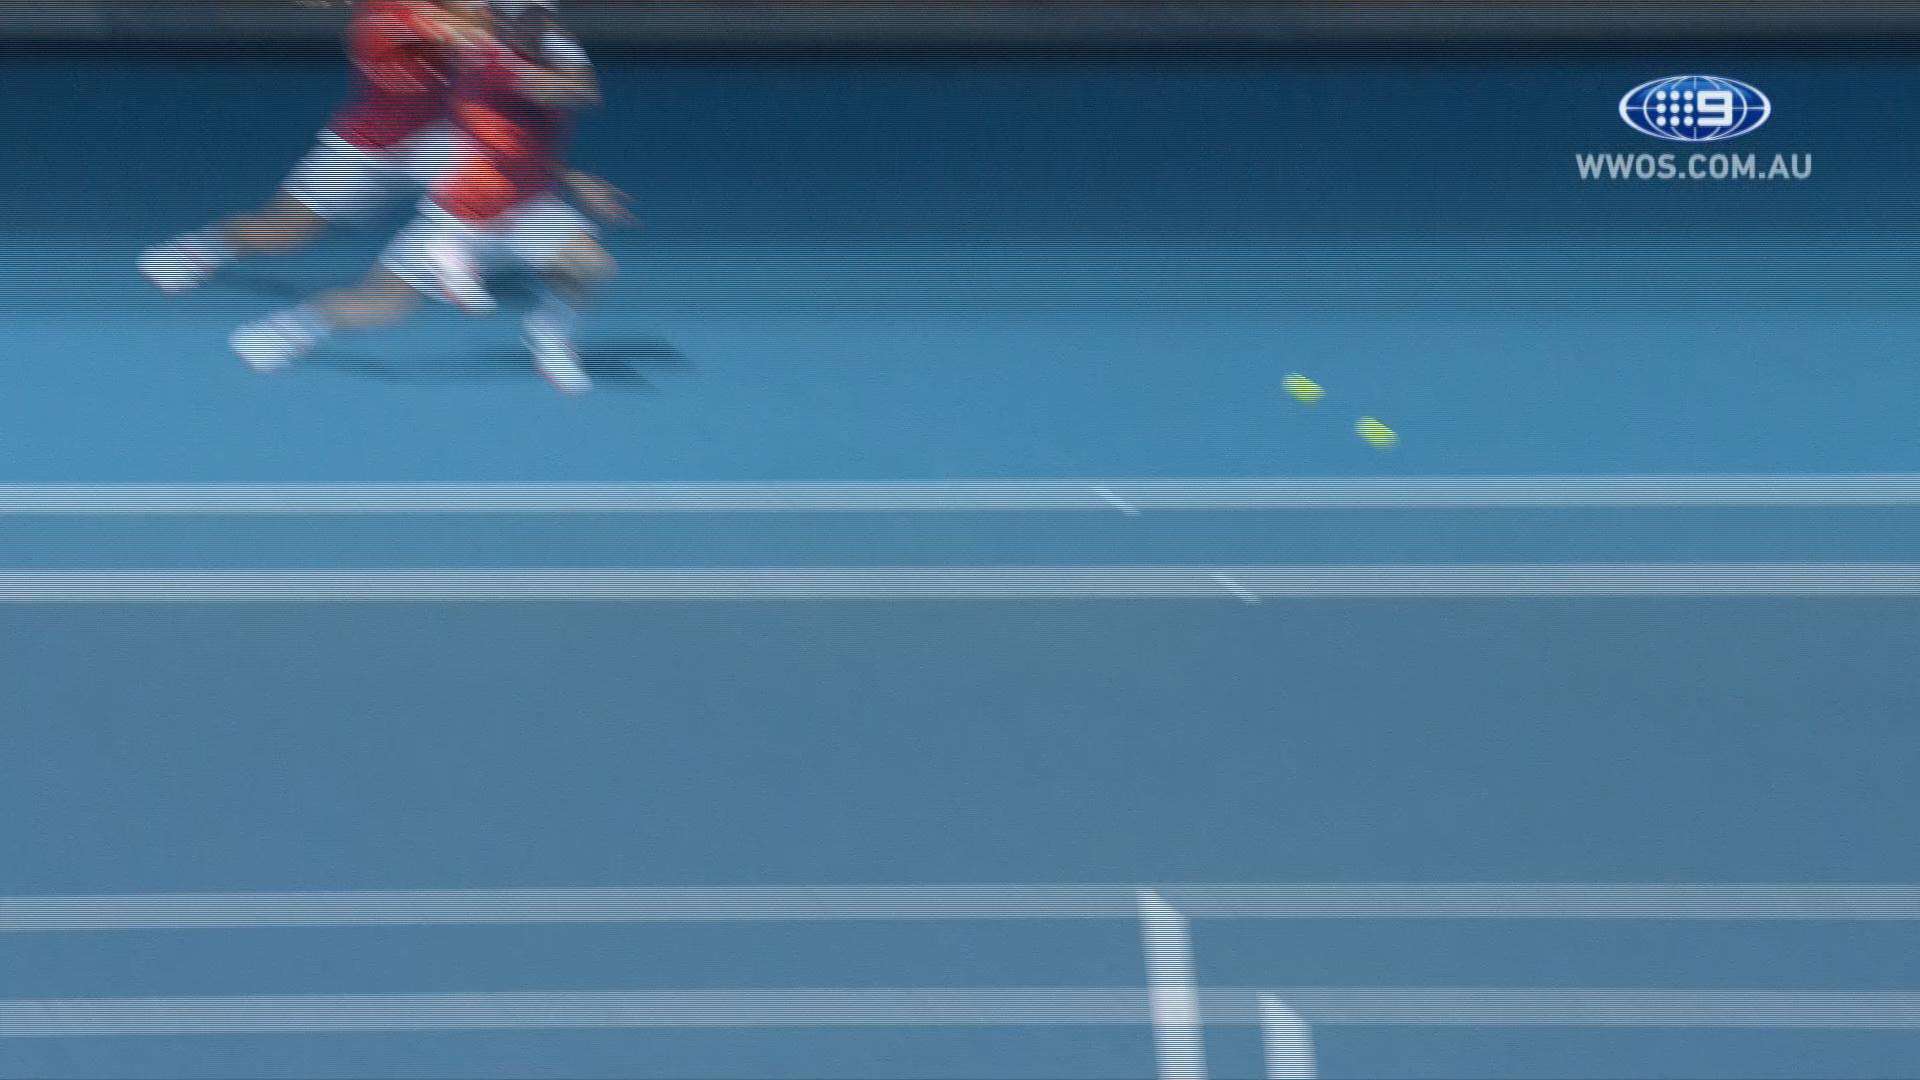 ATP Cup: Dominic Thiem V Matteo Berrettini